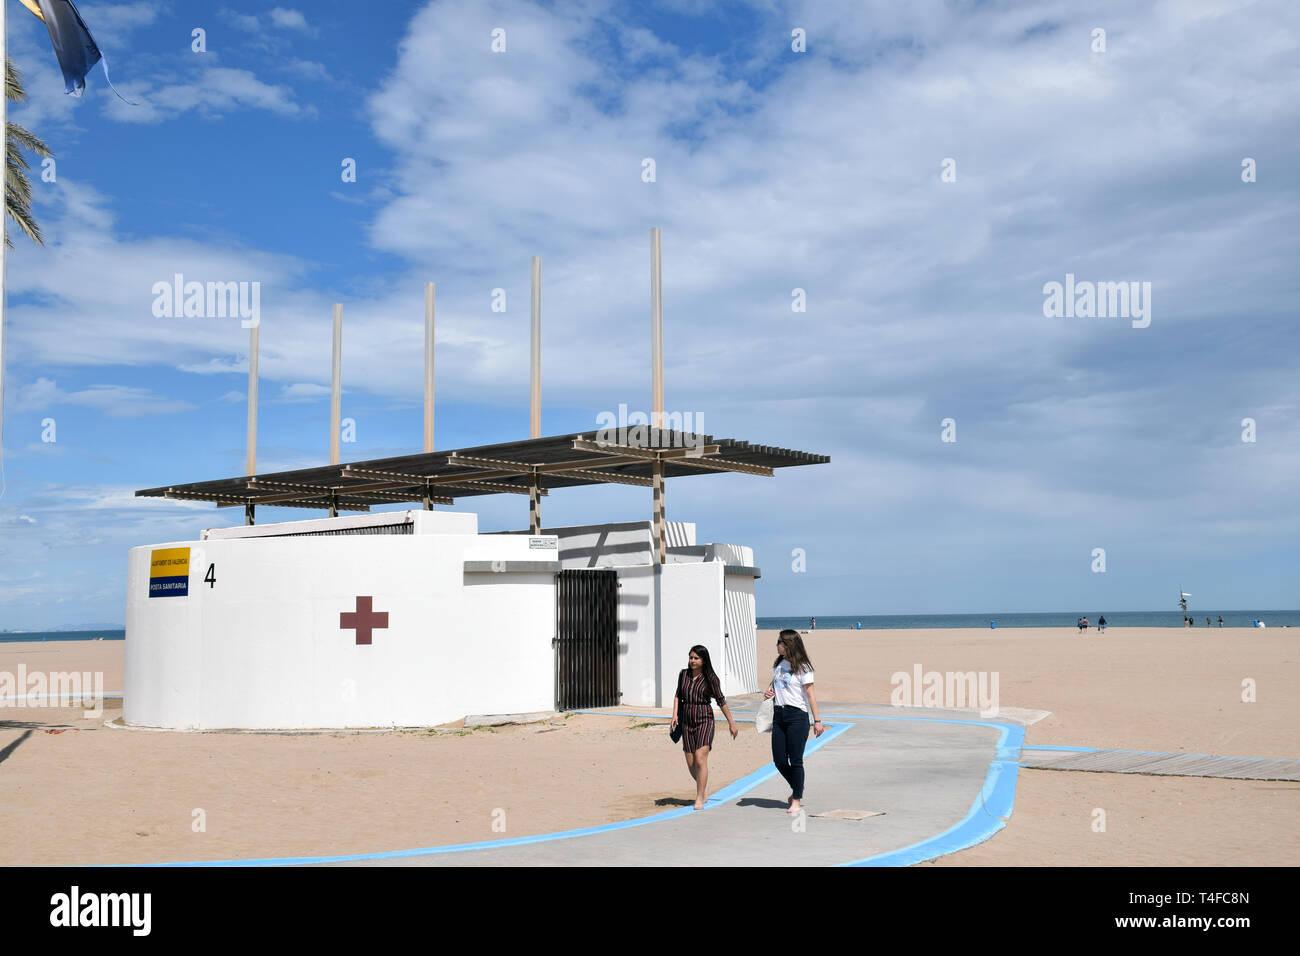 Primo soccorso post, Cabanyal beach, Valencia, Spagna Aprile 2019 Immagini Stock